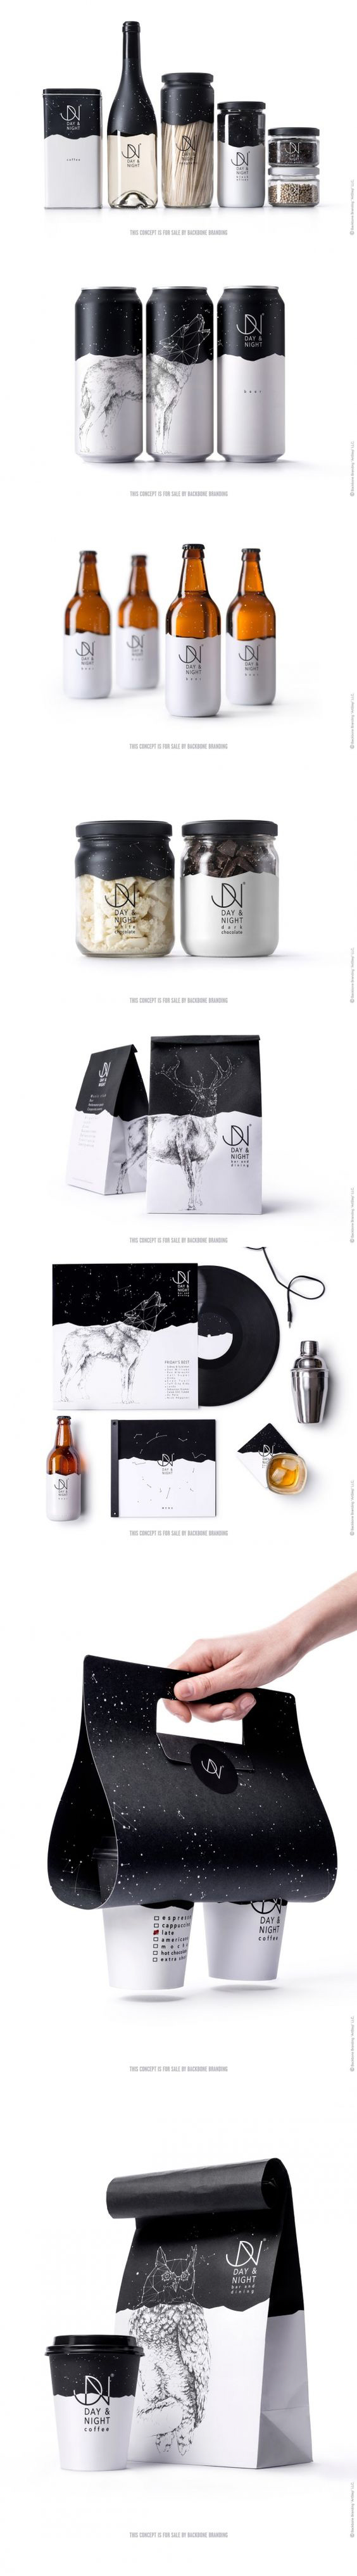 design_packaging07